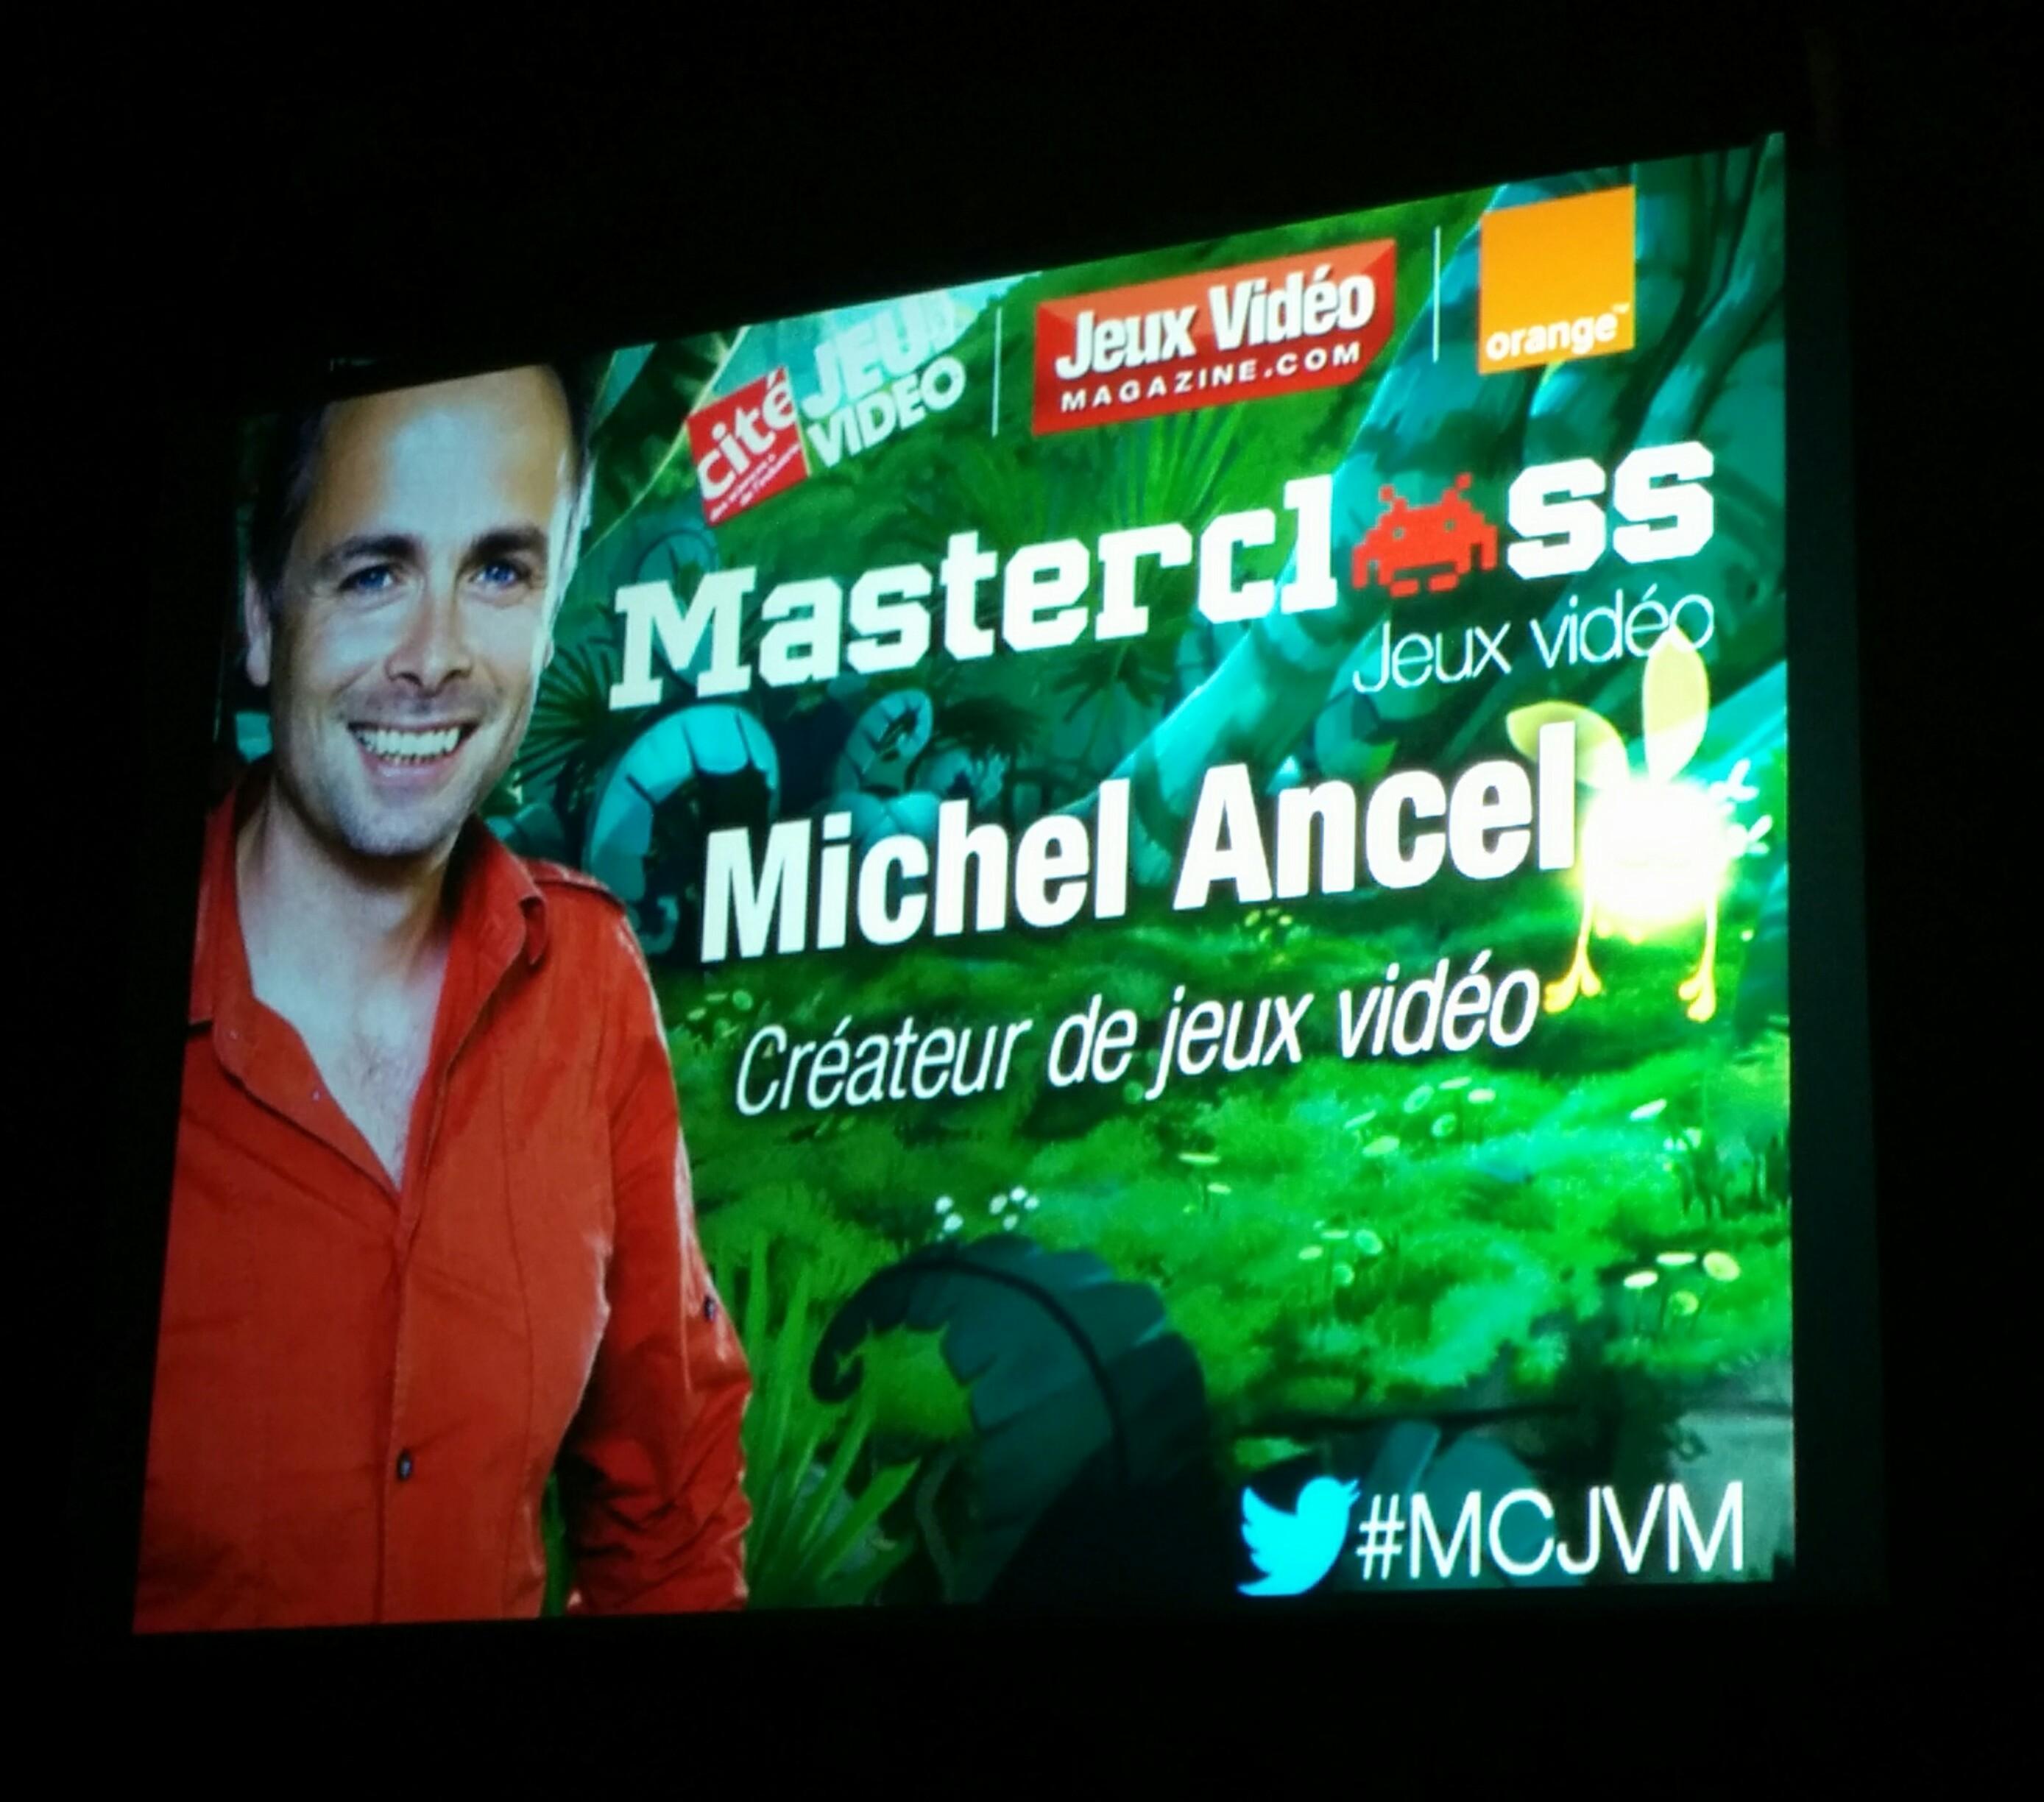 [COMPTE-RENDU] MasterClass avec Michel Ancel